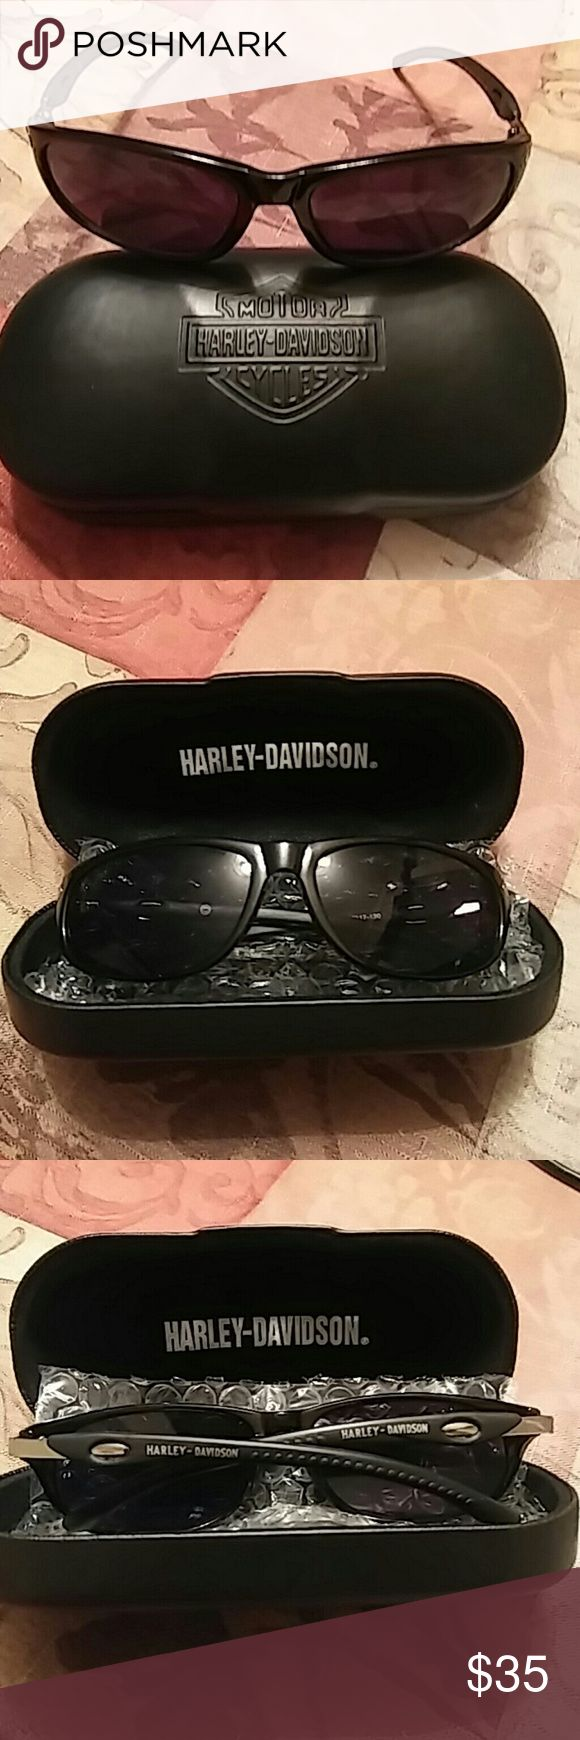 Harley Davidson Sunglasses w/case Black Harley Davidson Sunglasses, HDS 335 Blk-3 59 17-130, never worn... Harley-Davidson Accessories Glasses